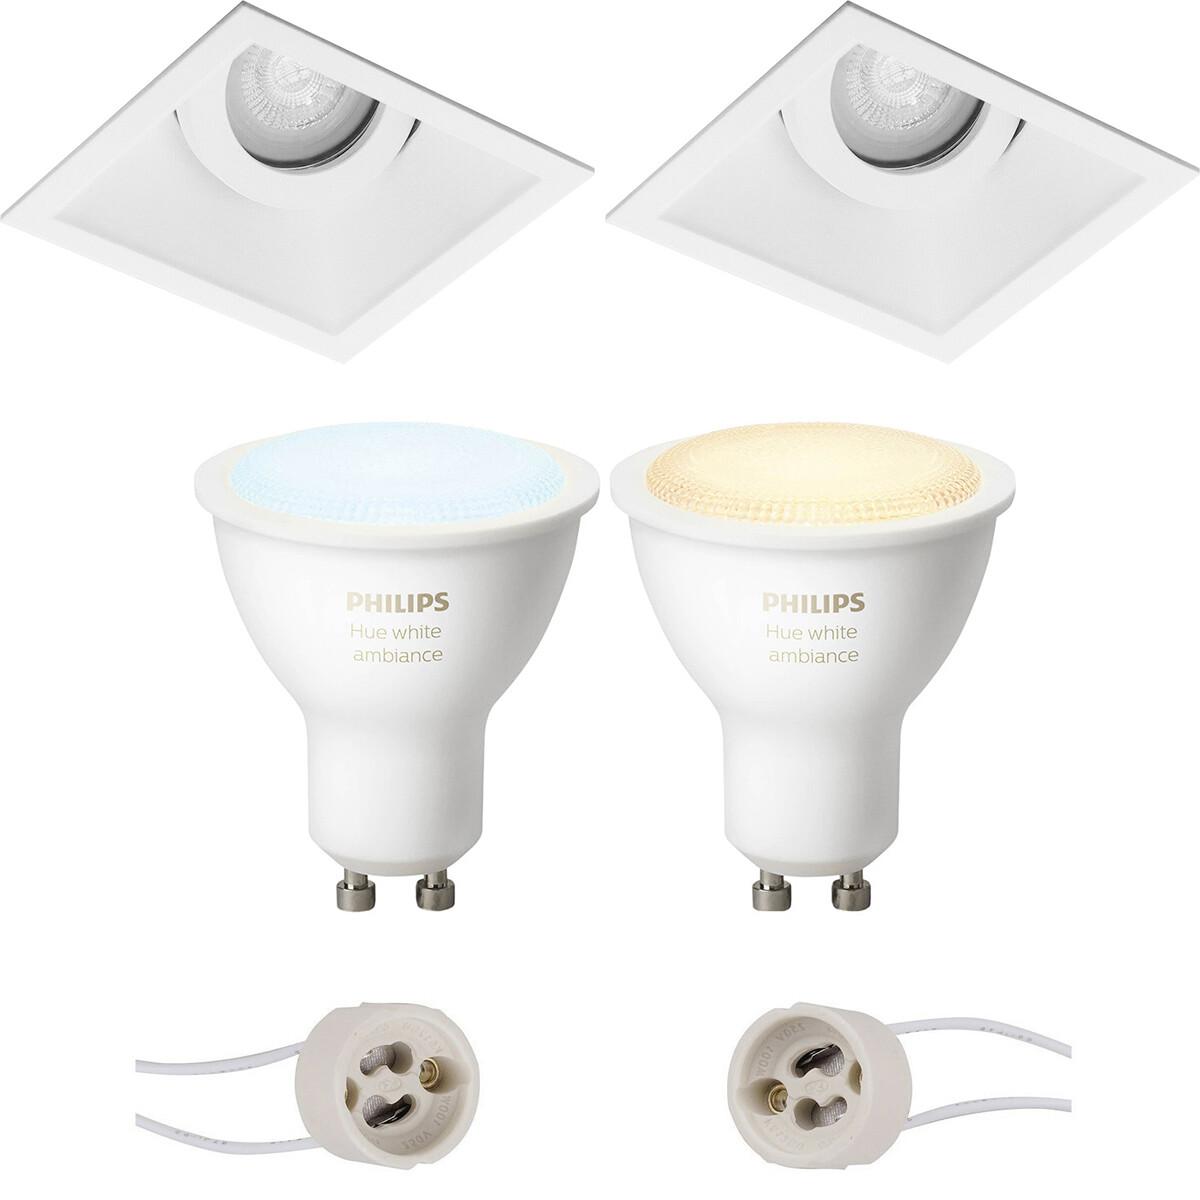 Pragmi Zano Pro - Inbouw Vierkant - Mat Wit - Kantelbaar - 93mm - Philips Hue - LED Spot Set GU10 -